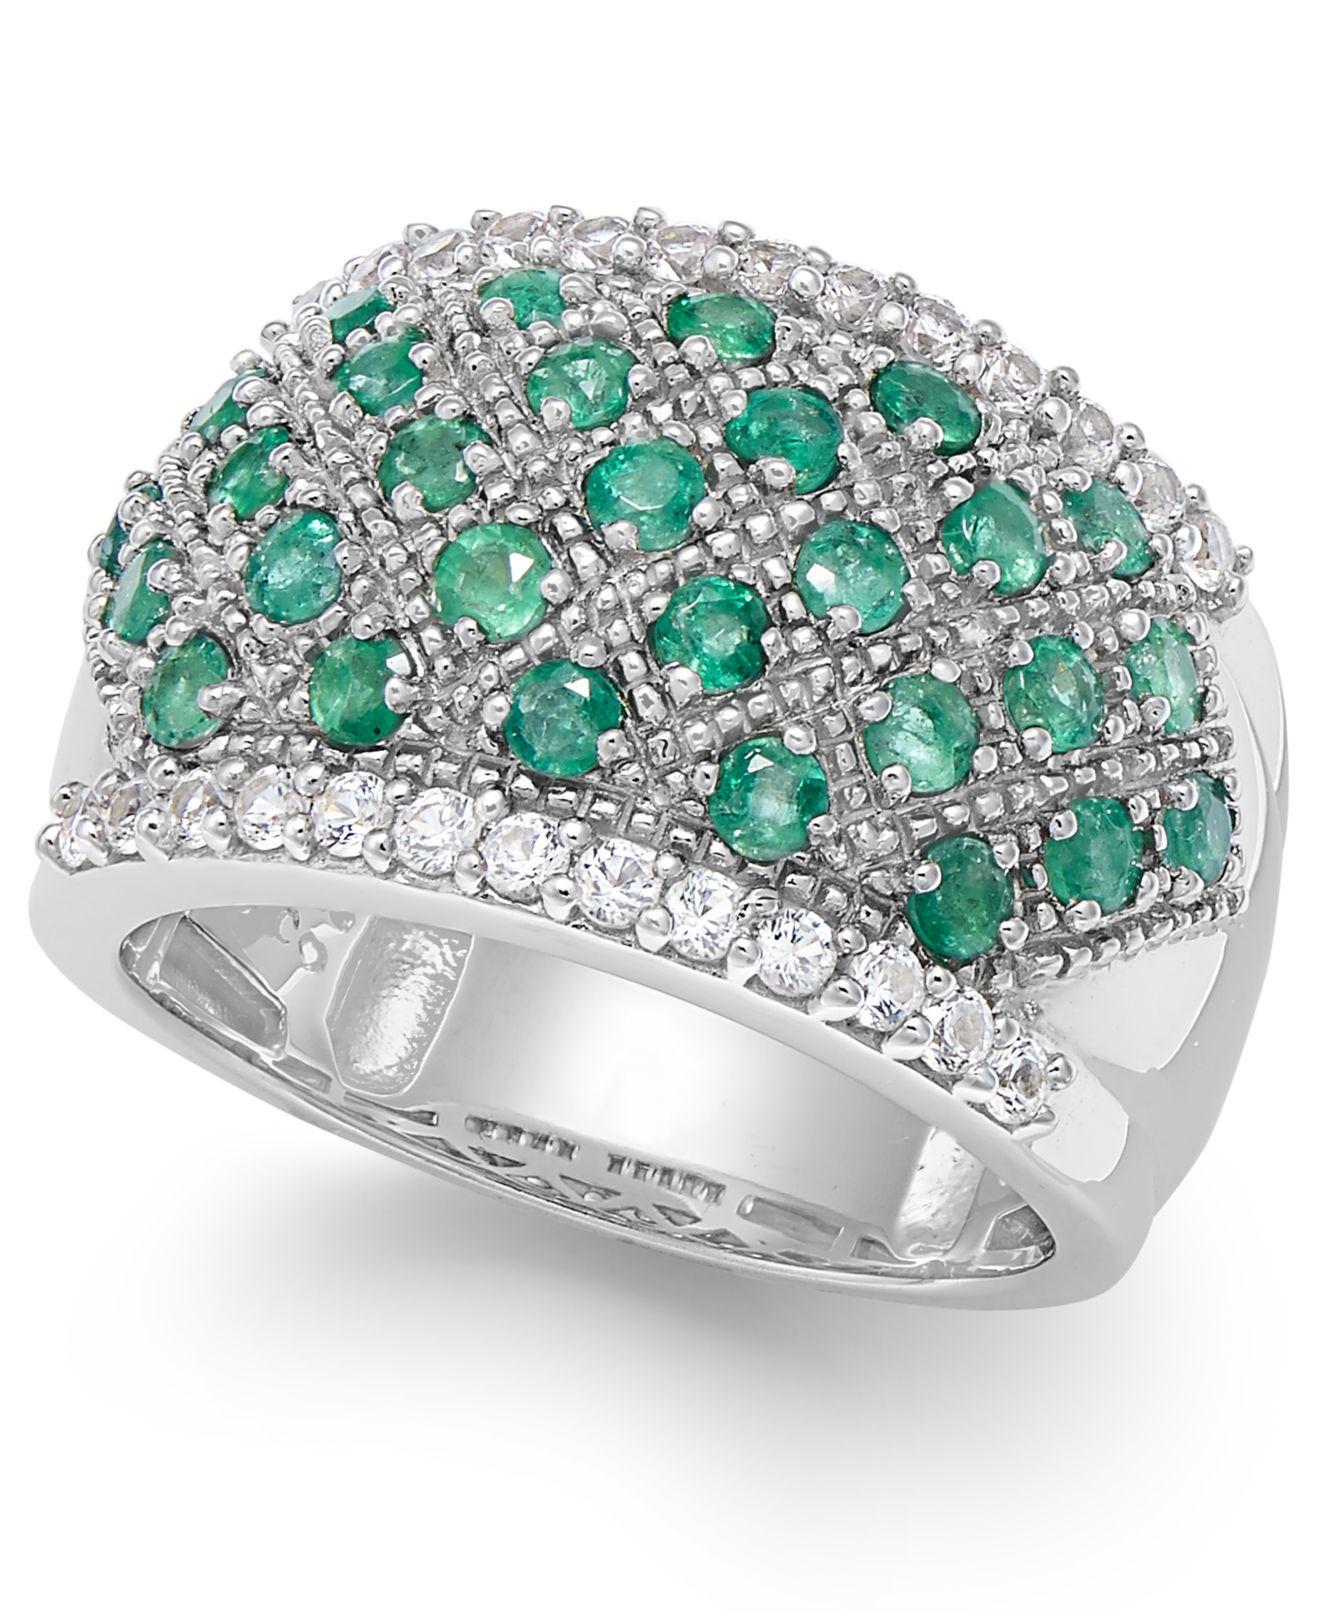 macy s emerald 1 1 6 ct t w and white sapphire 7 8 ct